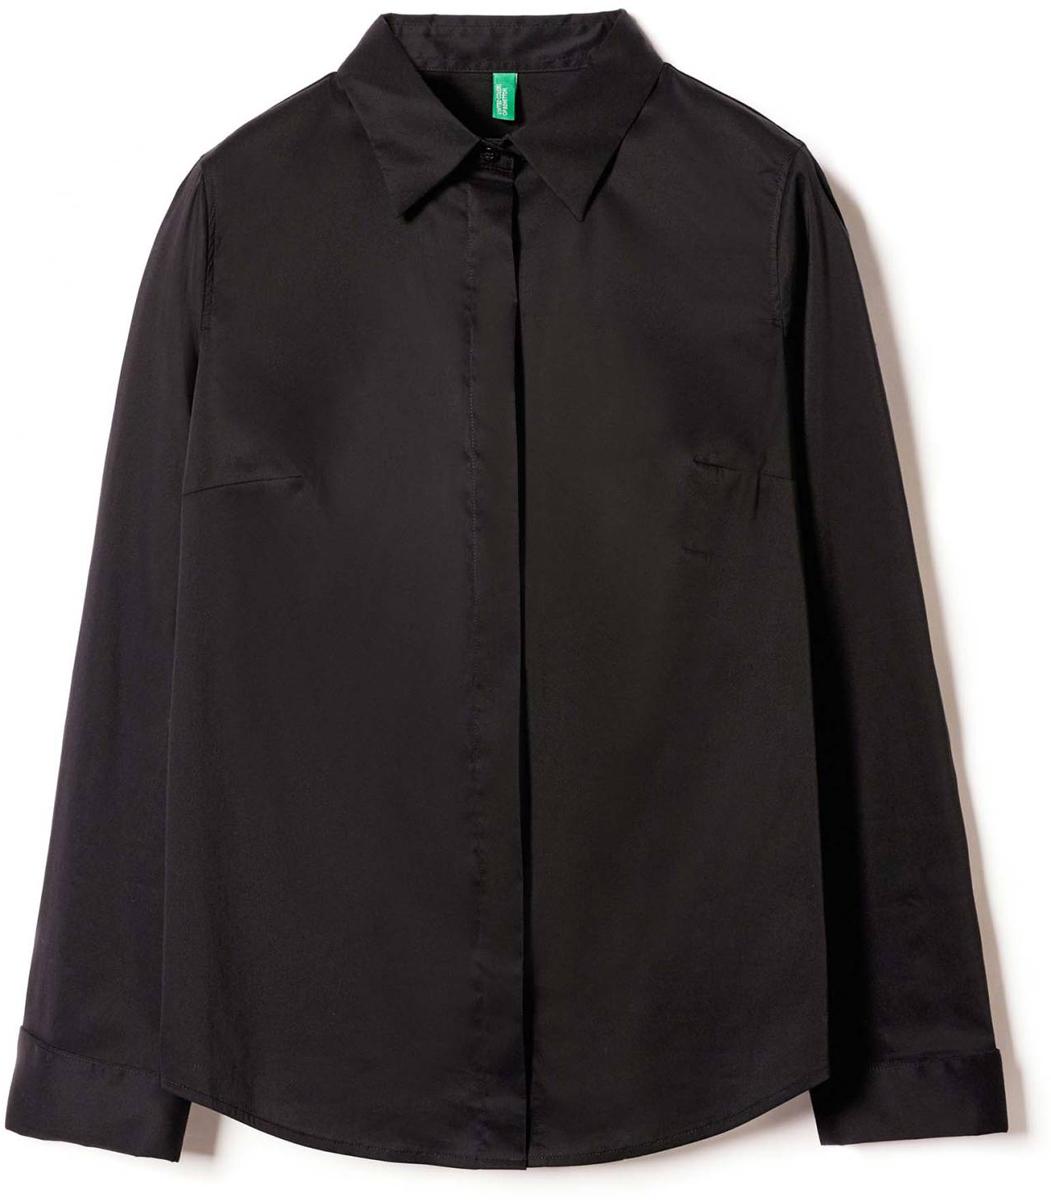 Рубашка жен United Colors of Benetton, цвет: черный. 5AWR5Q6E3_100. Размер XL (48/50)5AWR5Q6E3_100